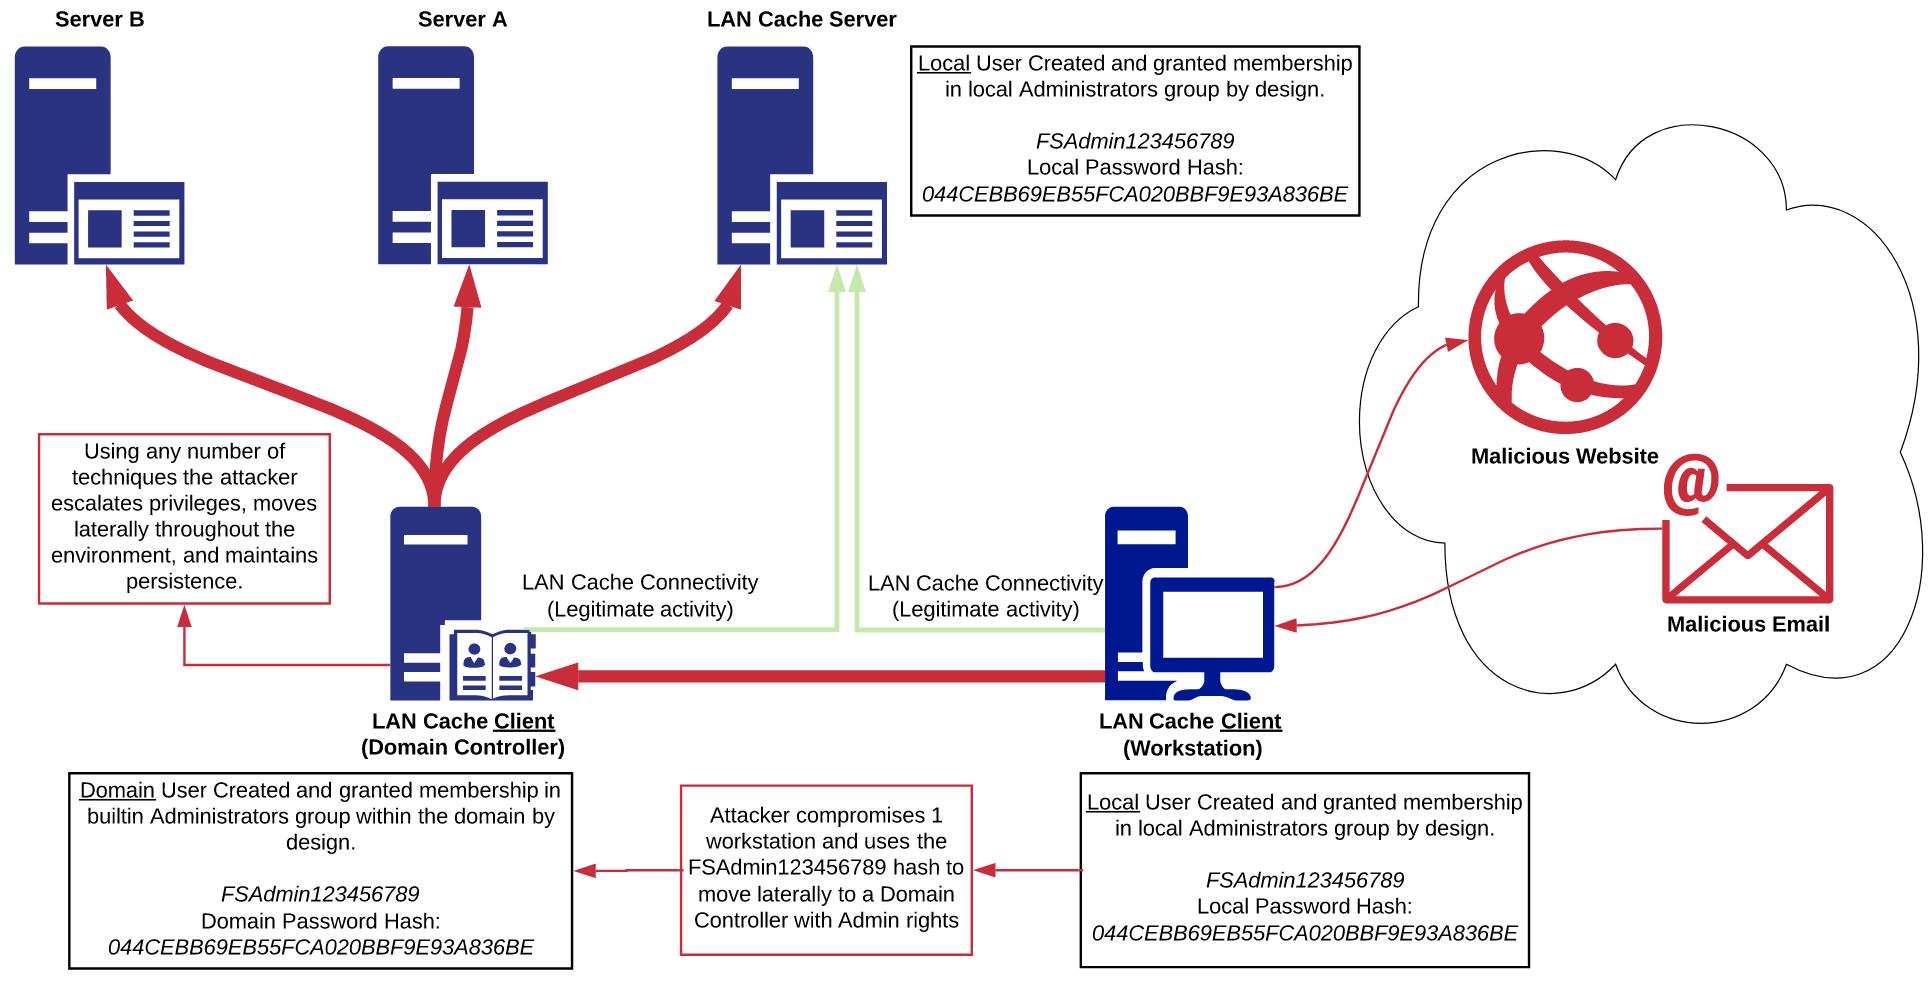 LAN Cache workflow